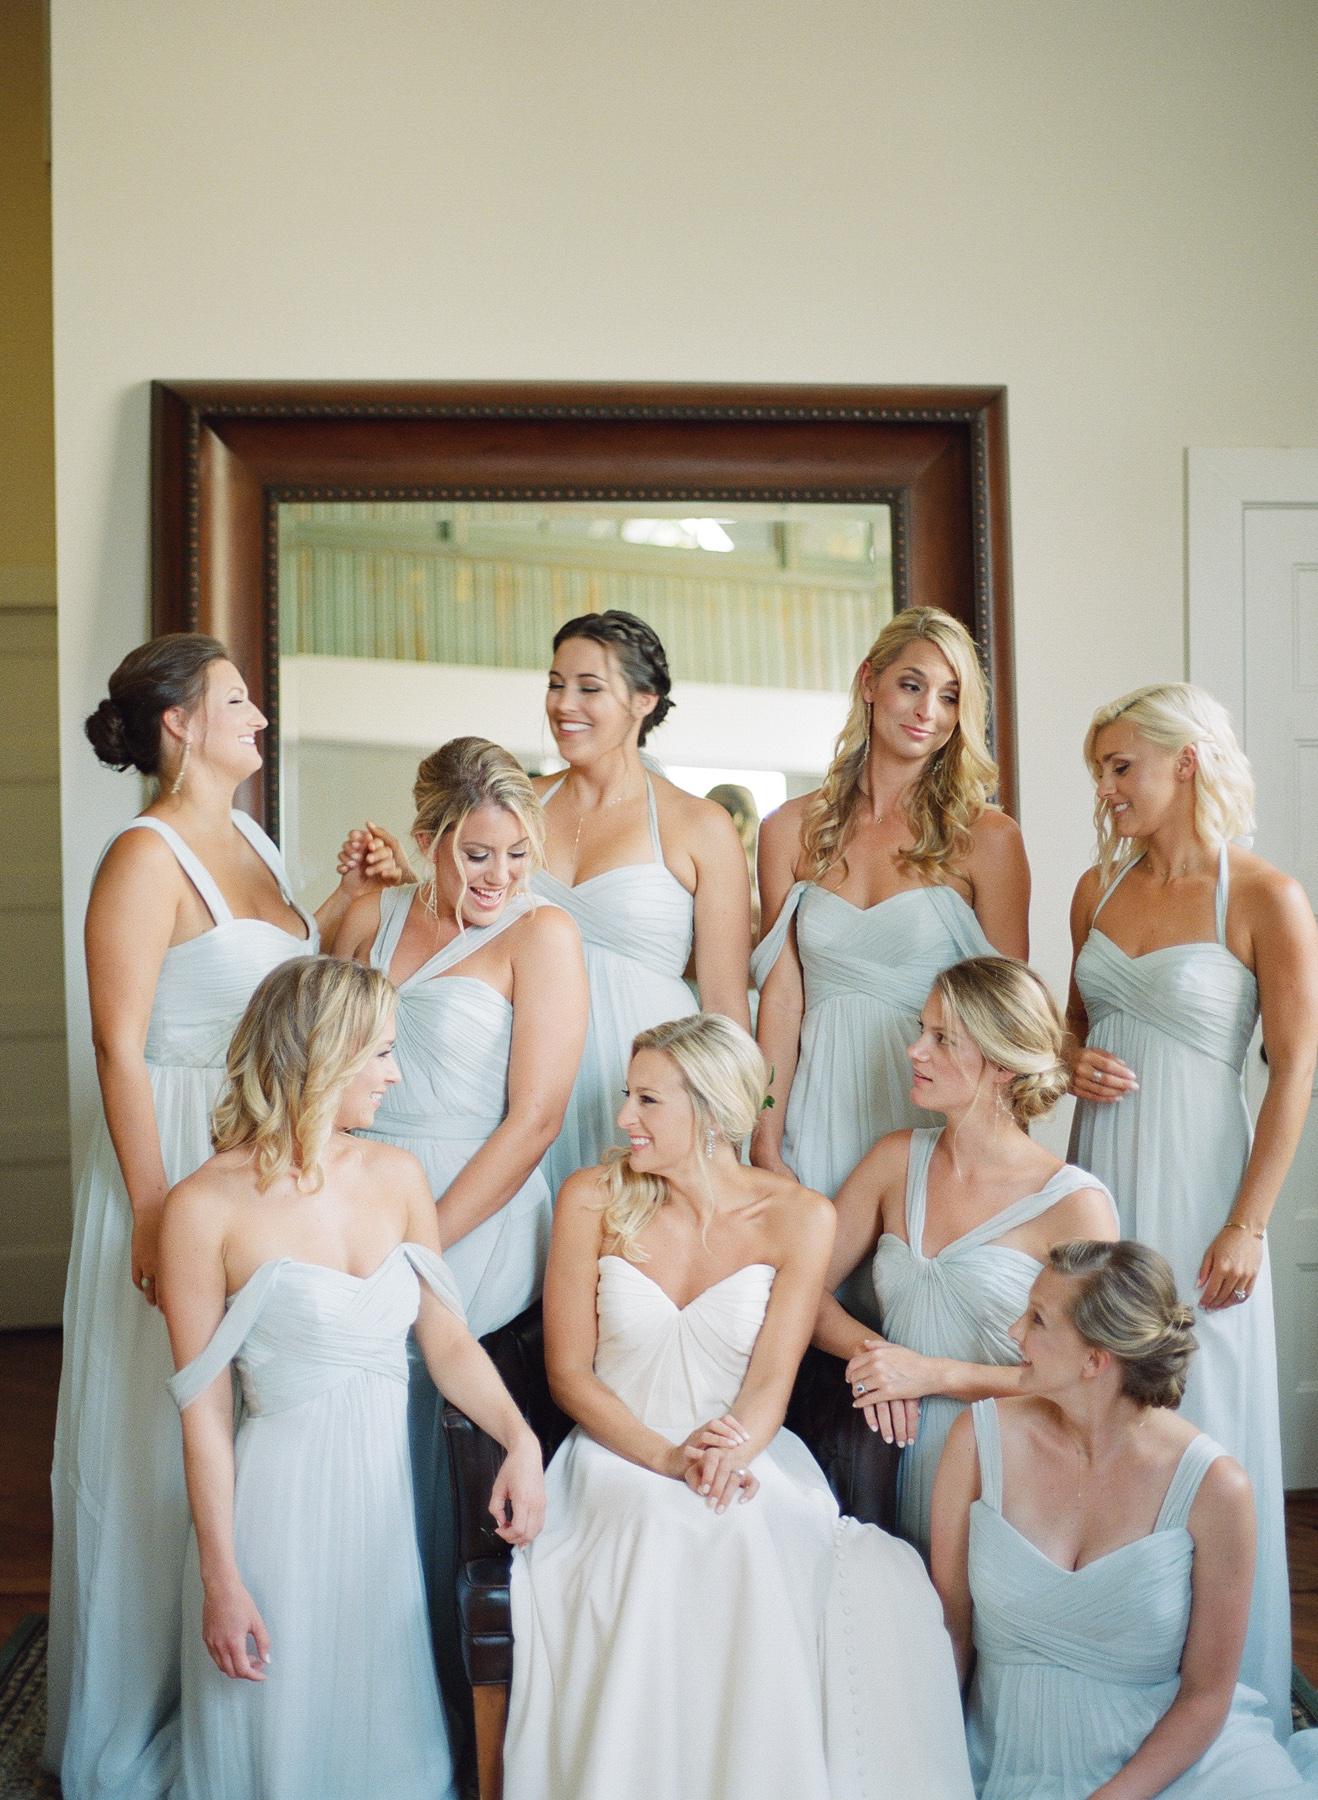 NC-wedding-venues-film-photographer-19.jpg